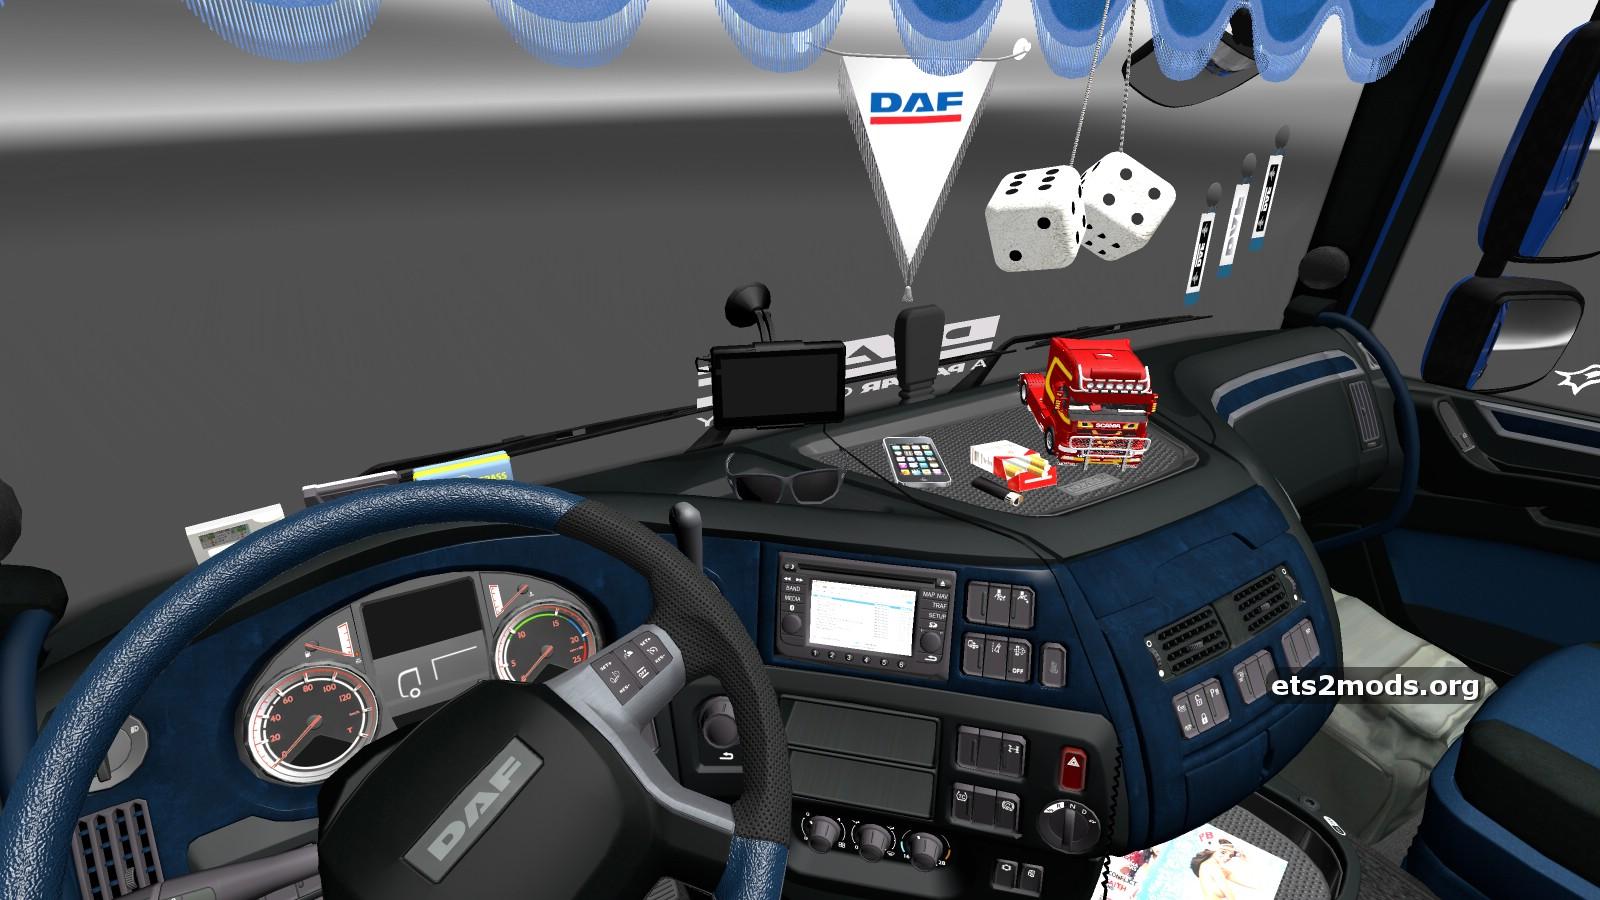 Daf euro 6 cool interior ets2 mods for Daf euro 6 interieur